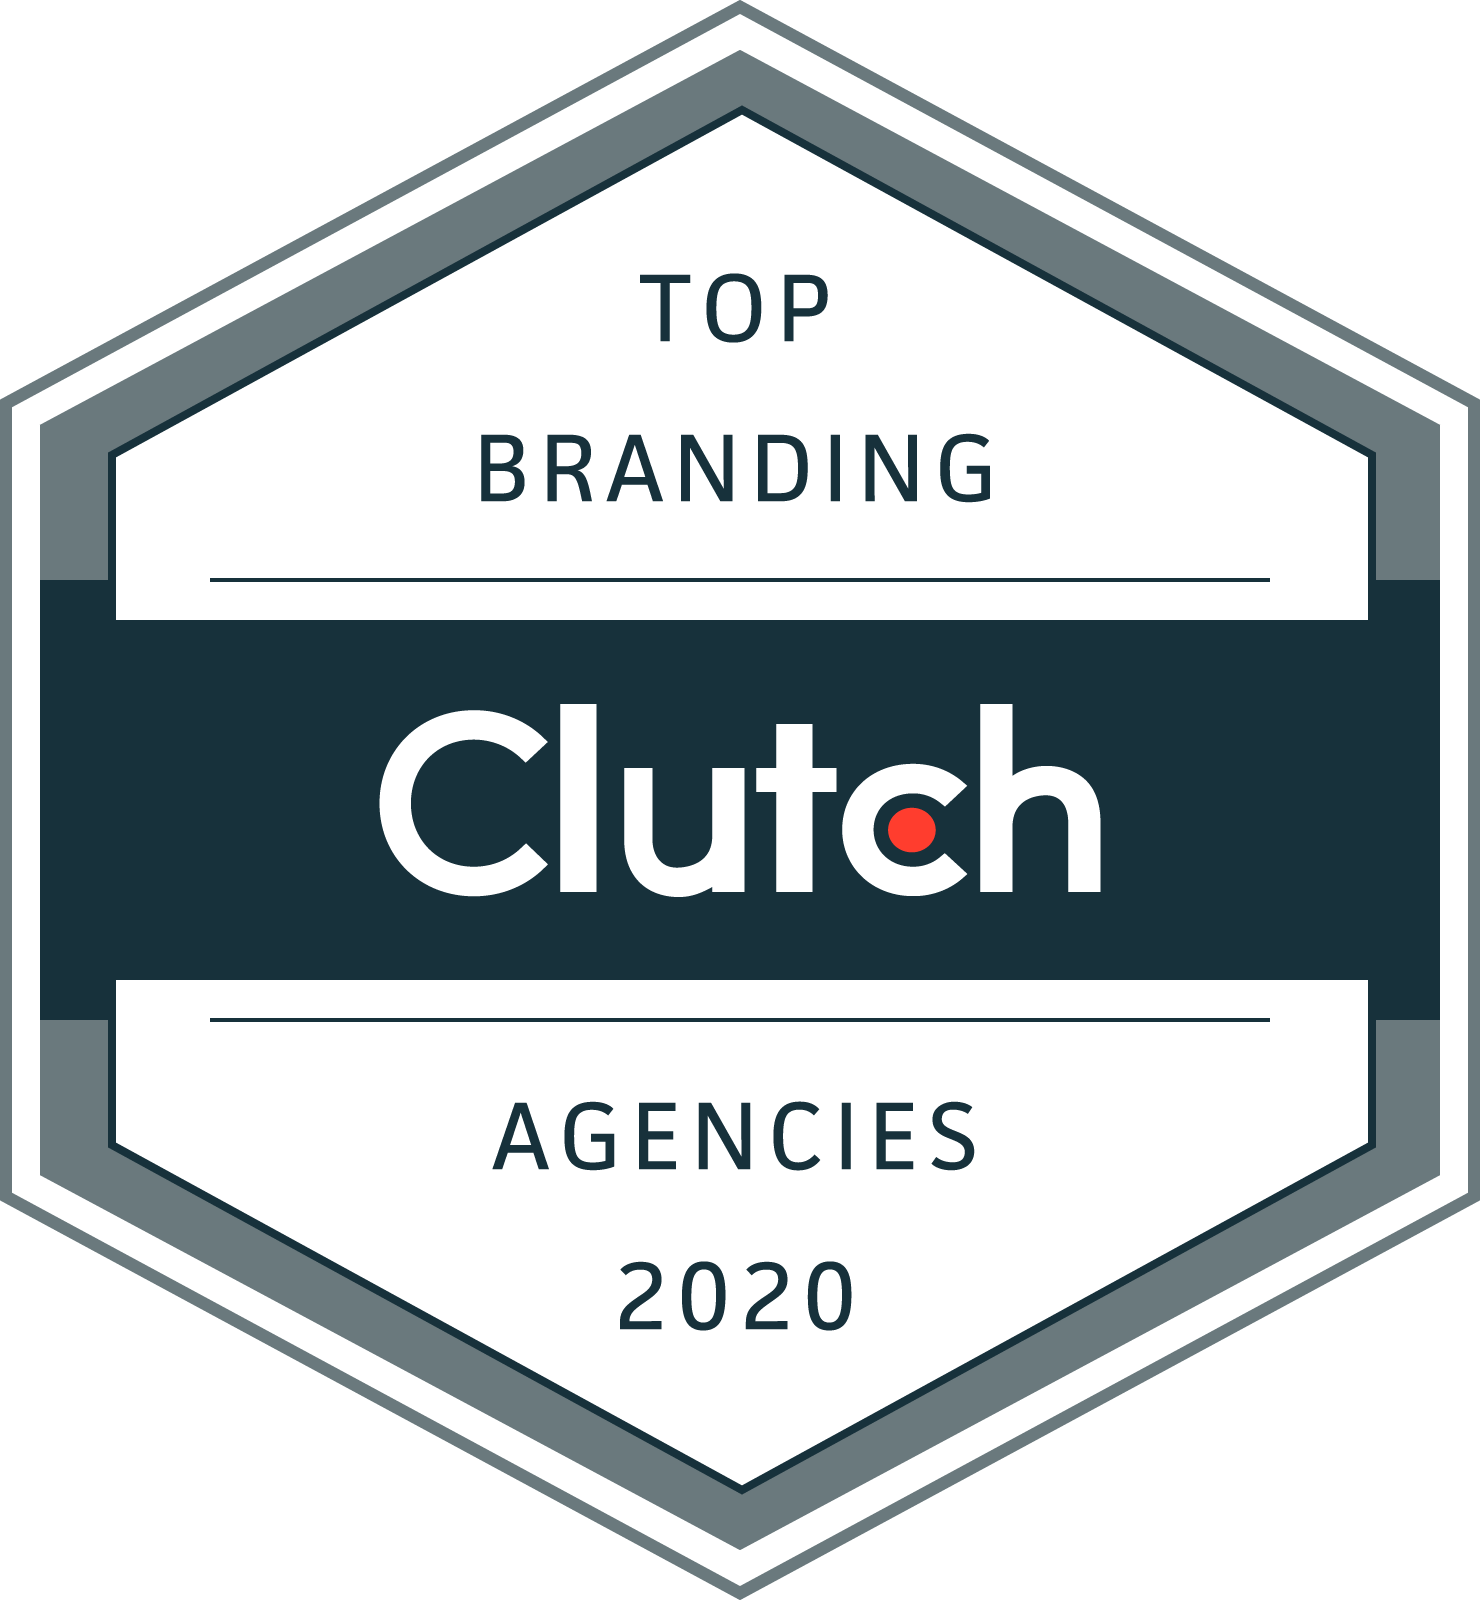 Best Branding Company 2020 Clutch Logo